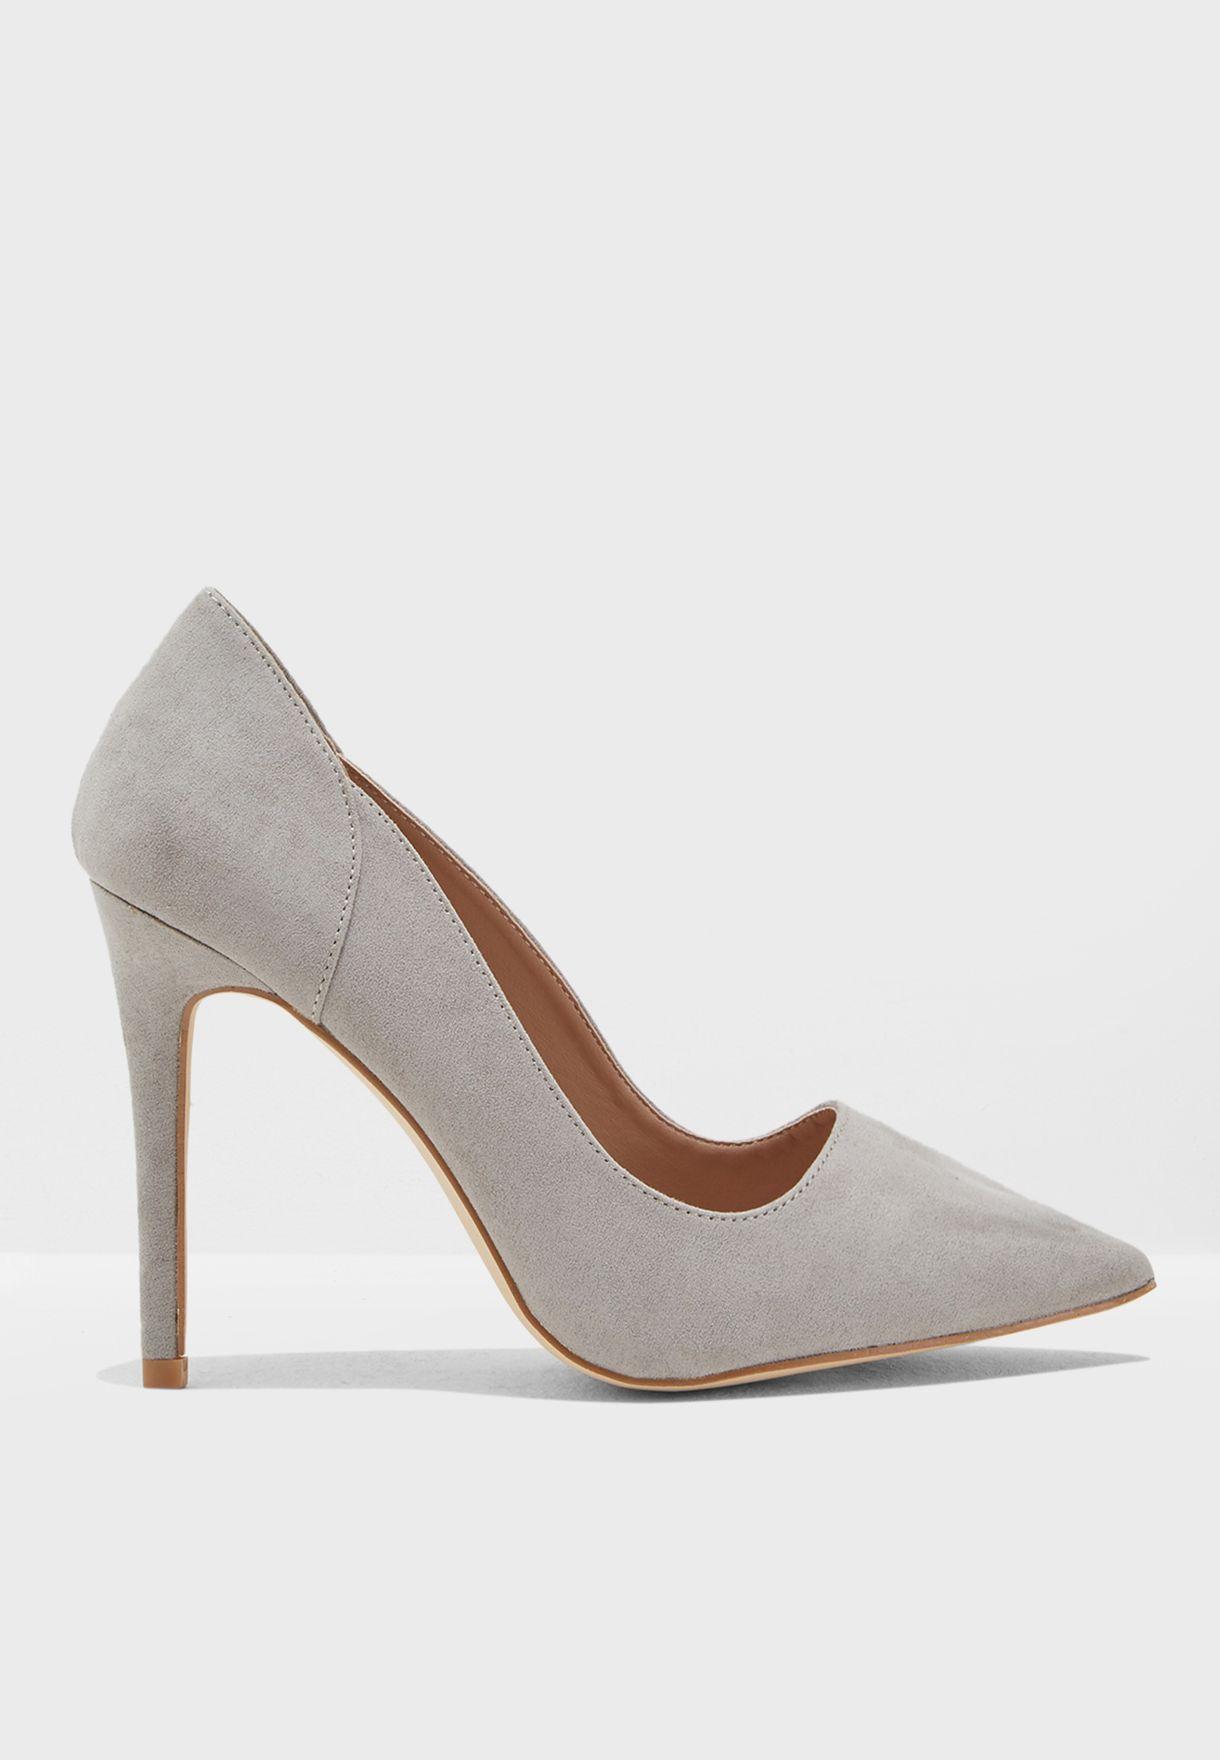 5632a5ff285f0 تسوق حذاء بكعب مرتفع ماركة نيو لوك لون رمادي 5796862 في السعودية ...